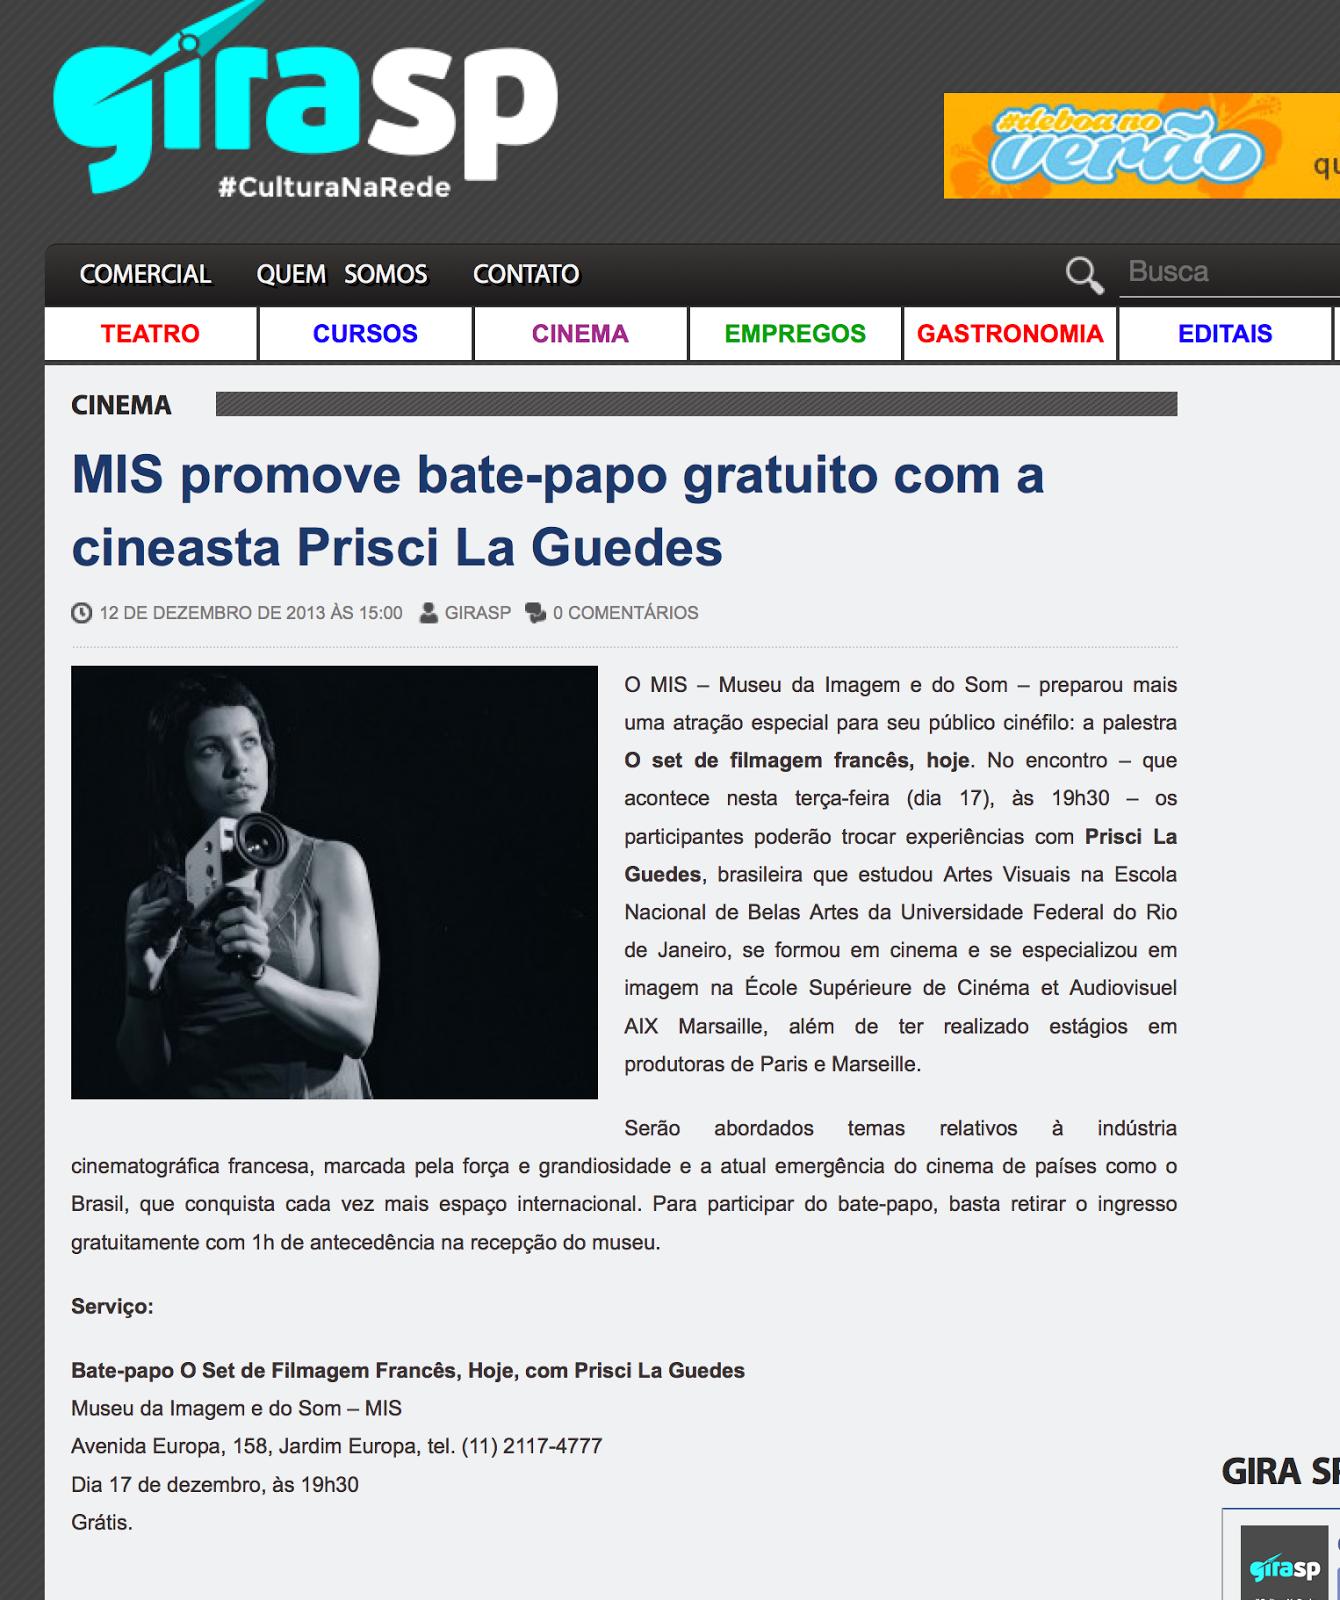 http://girasp.com.br/2013/12/mis-promove-bate-papo-gratuito-com-a-cineasta-prisci-la-guedes/